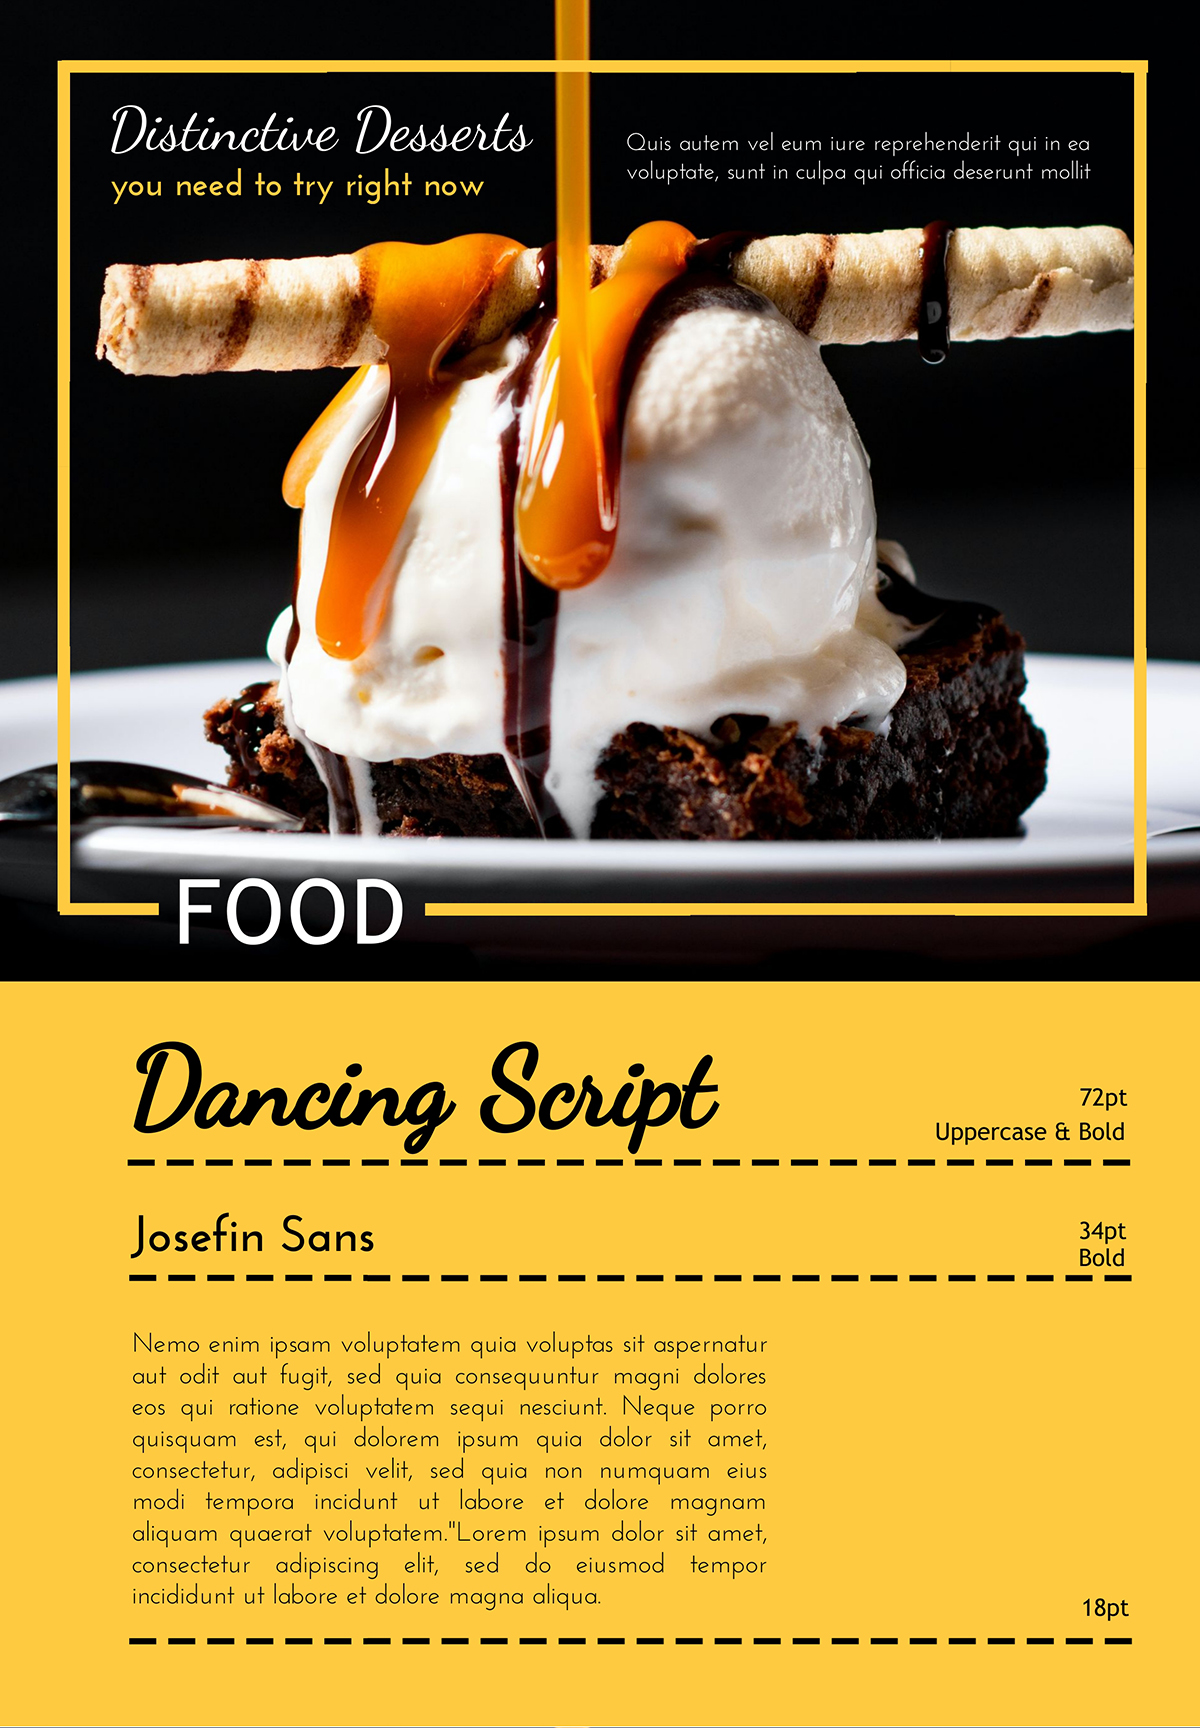 An example using the font pair Dancing Script and Josefin Sans.